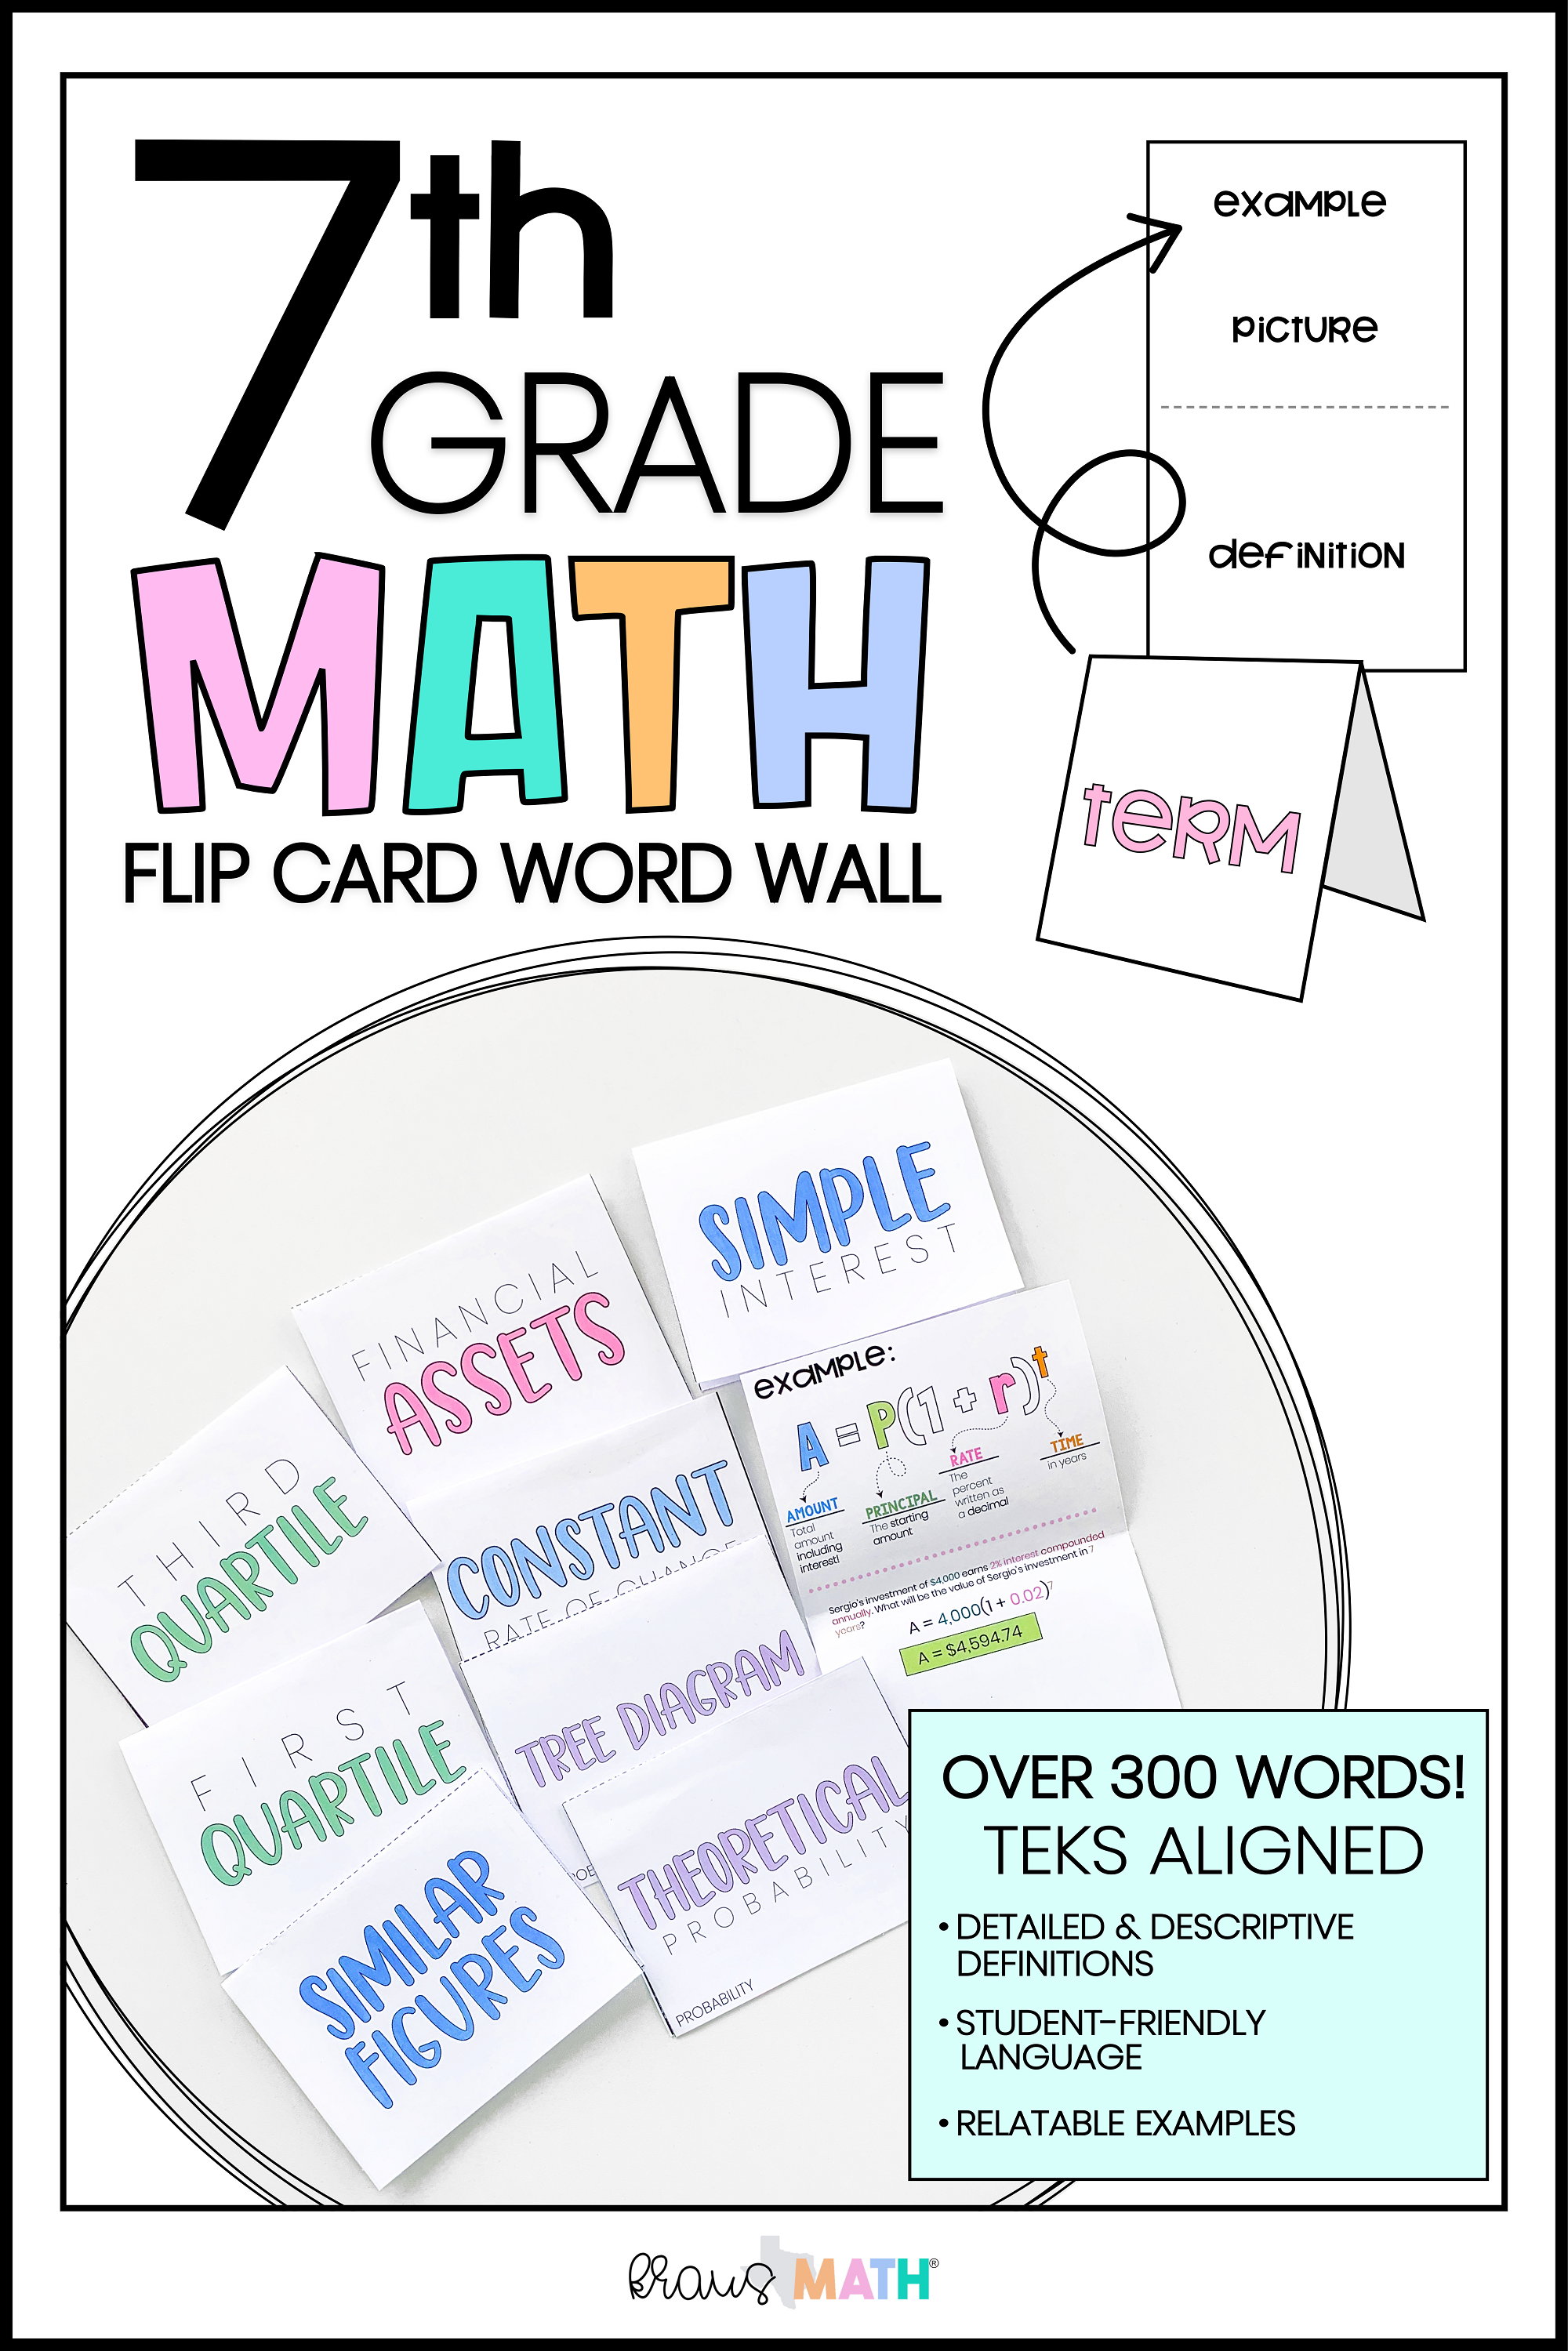 small resolution of 7th Grade Math FLIP CARD Word Wall   Kraus Math   7th grade math